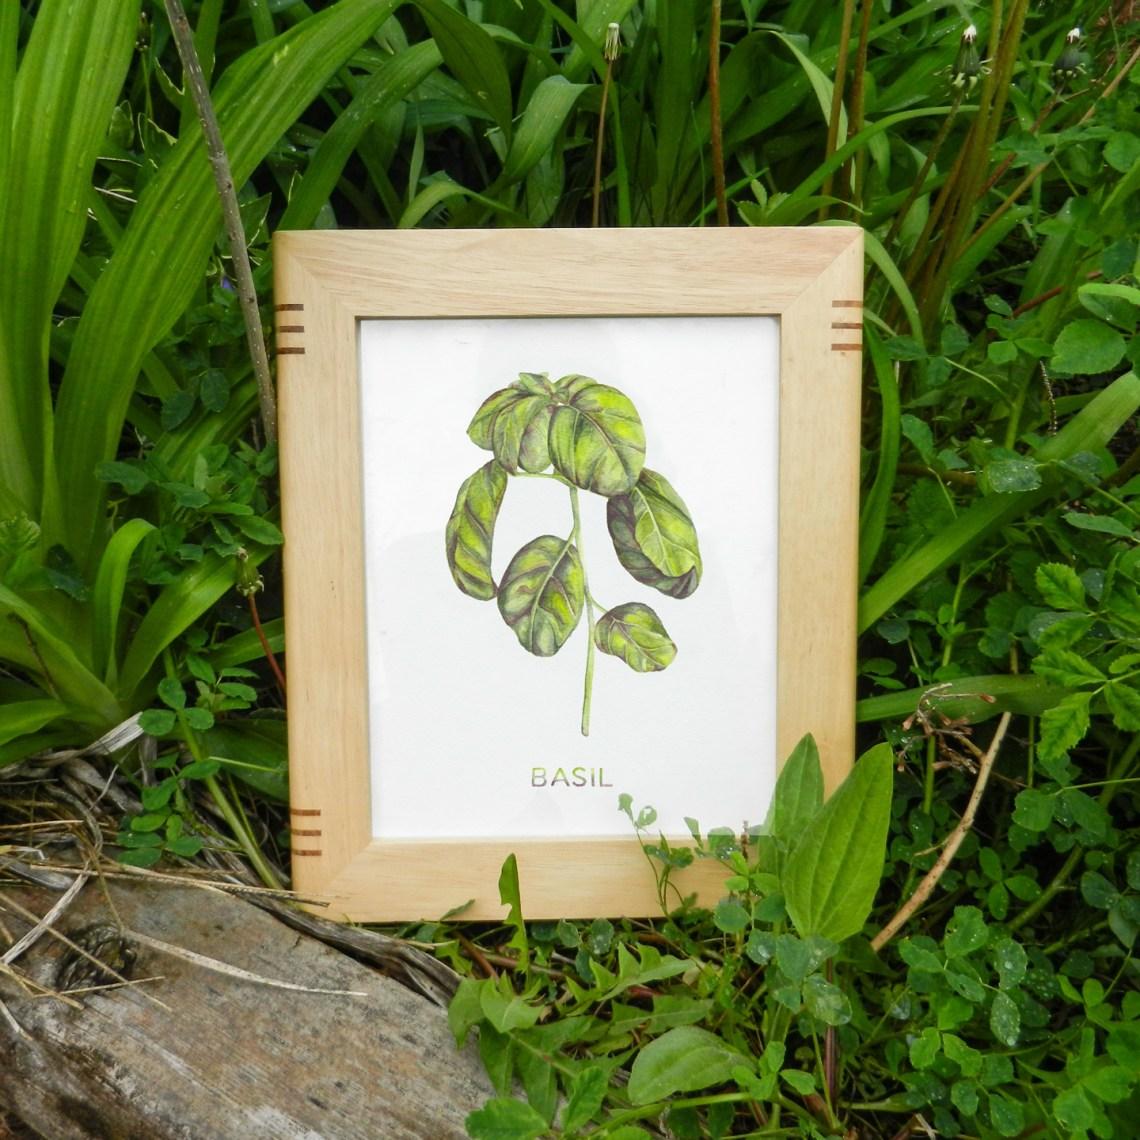 Free Watercolor Basil Art Printable   The Postman's Knock